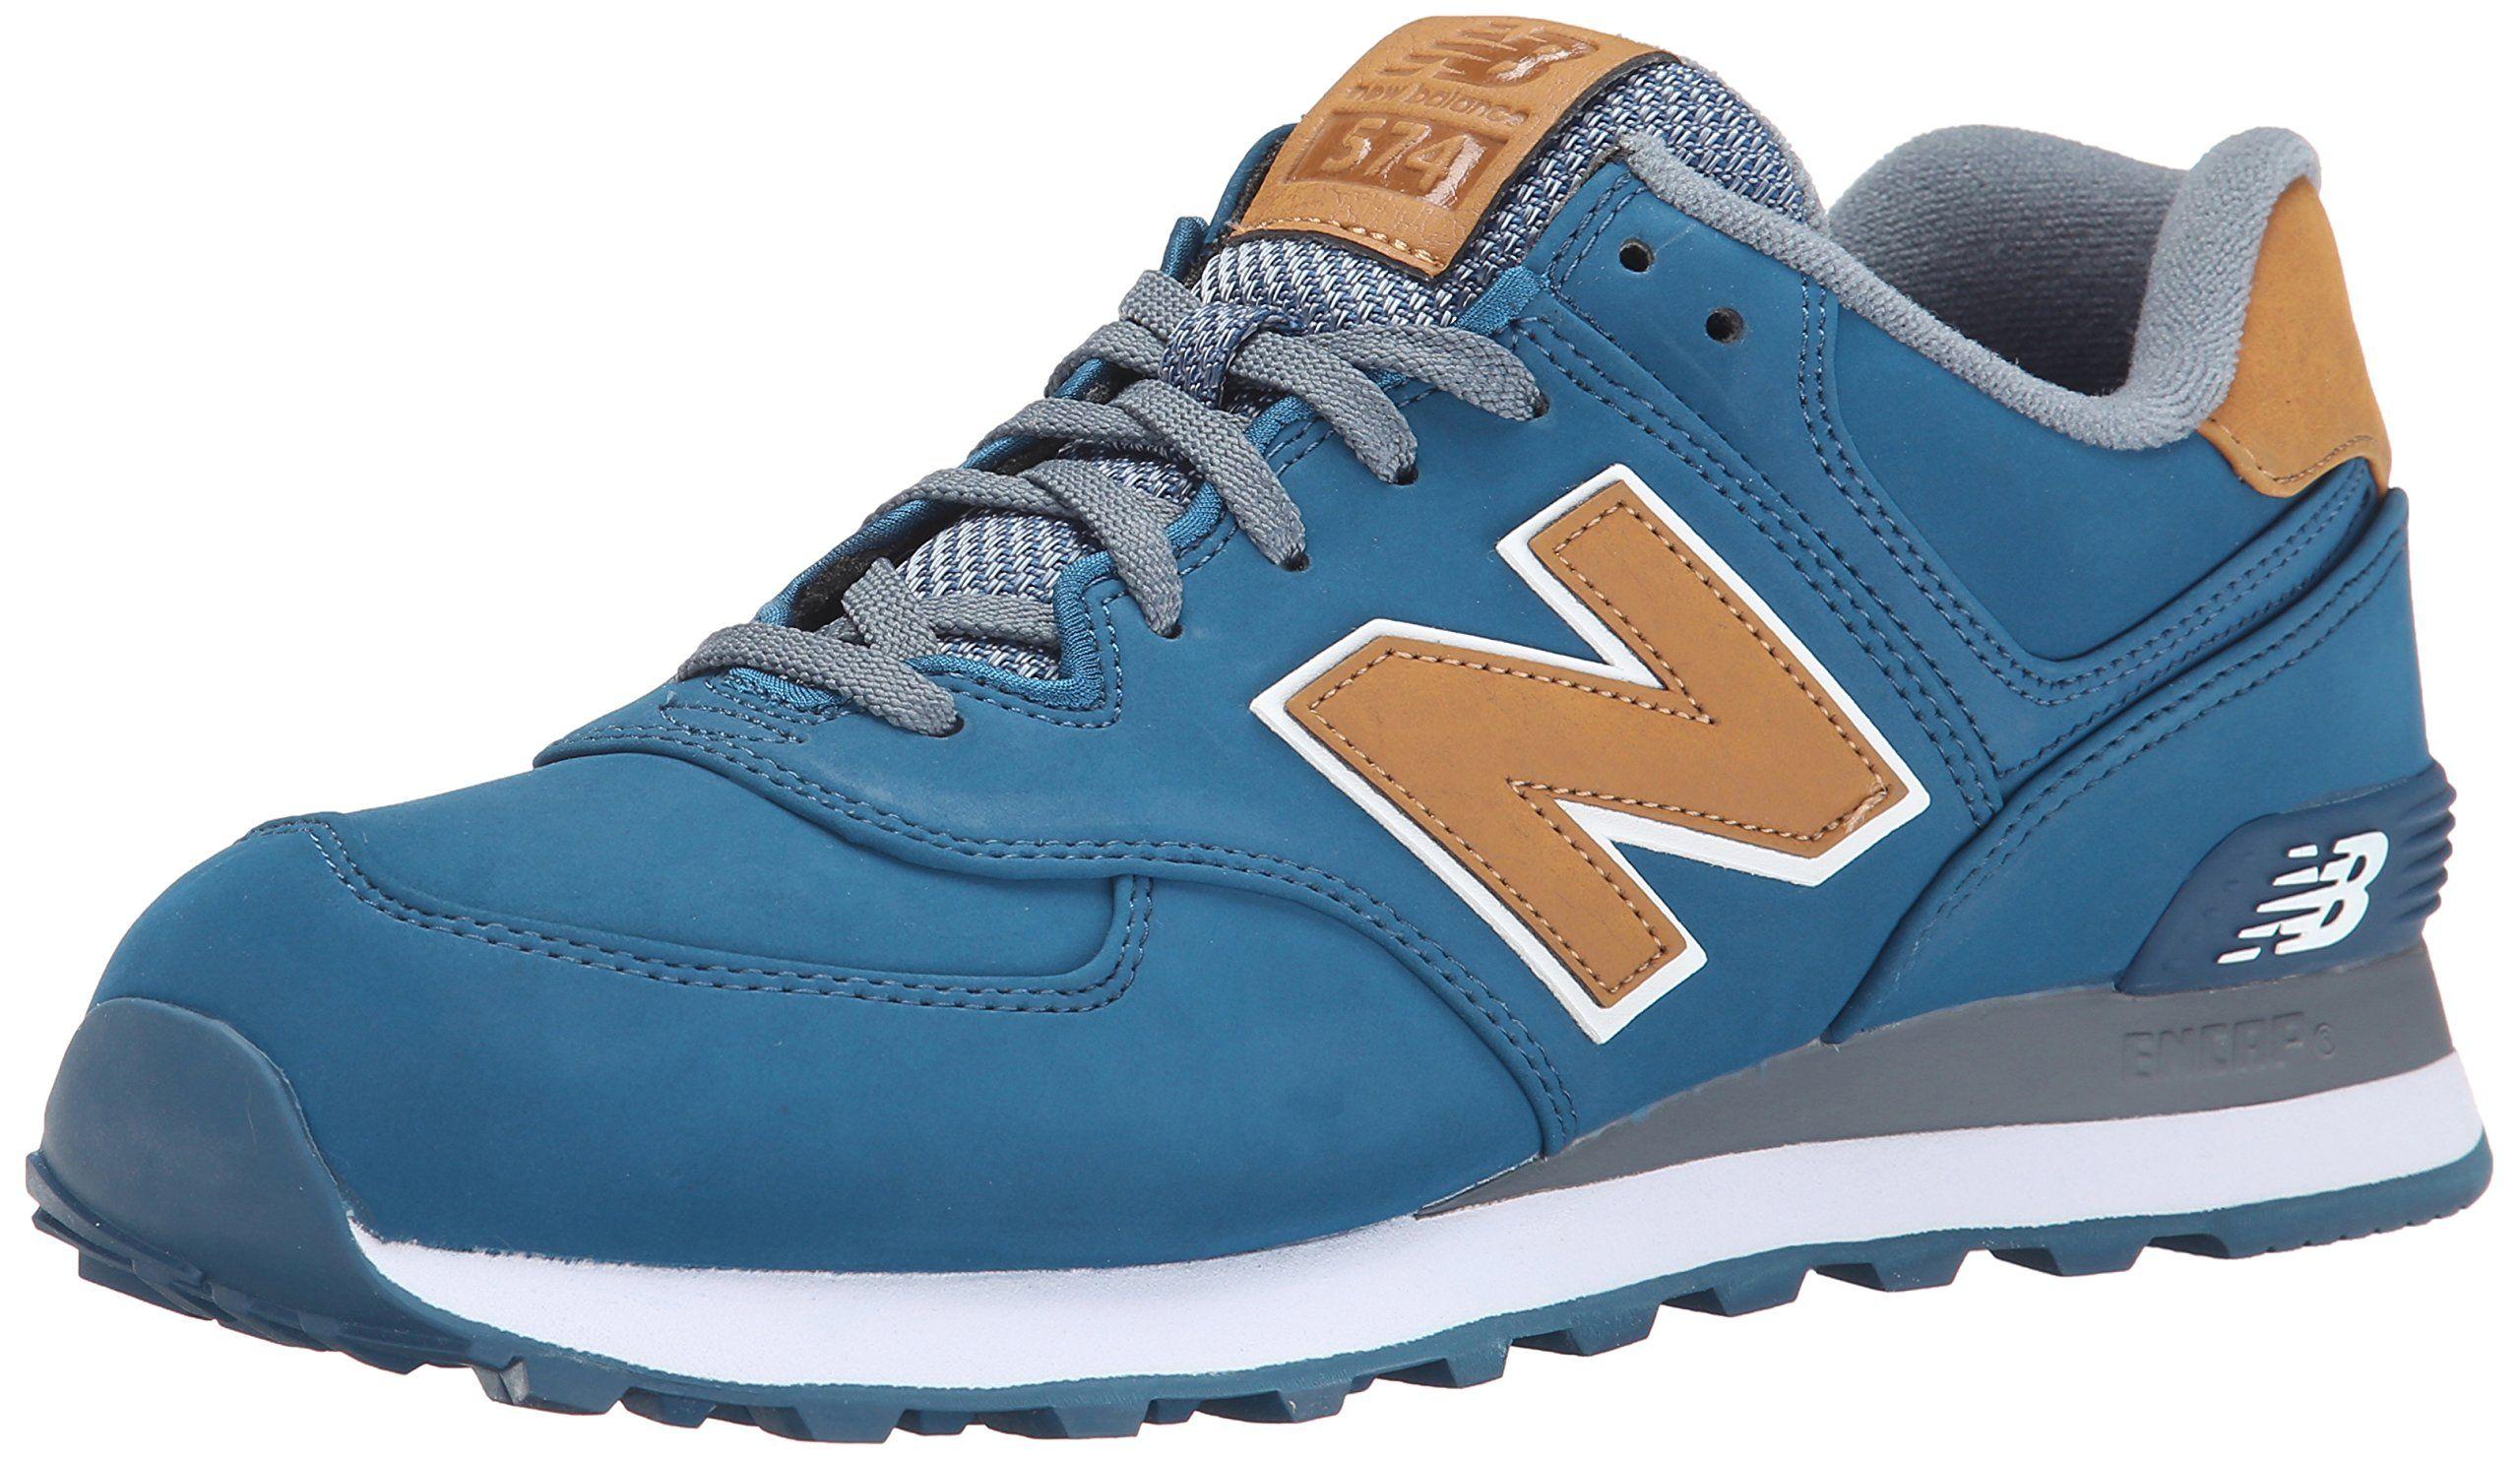 3509c0b3fdb3b Amazon.com: New Balance Men's ML574 Lux Pack Sneaker: Shoes | What ...